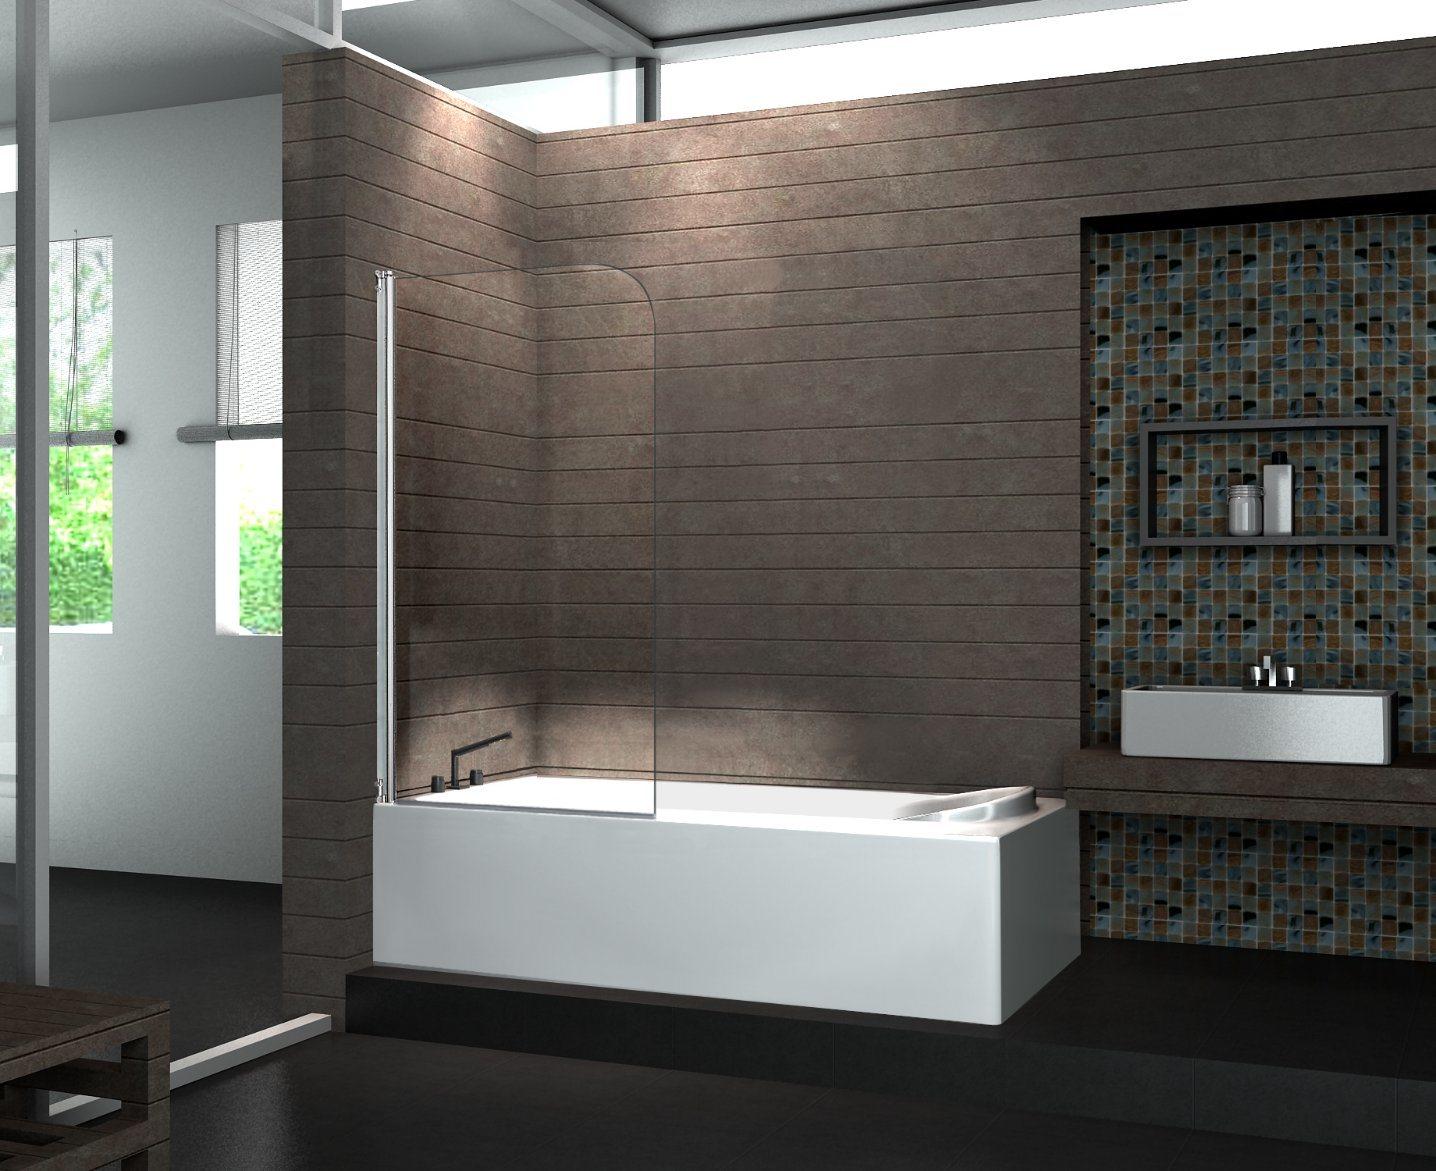 Bathtub Pivot Shower Glass Swing Bath Tub Screen Duschwand